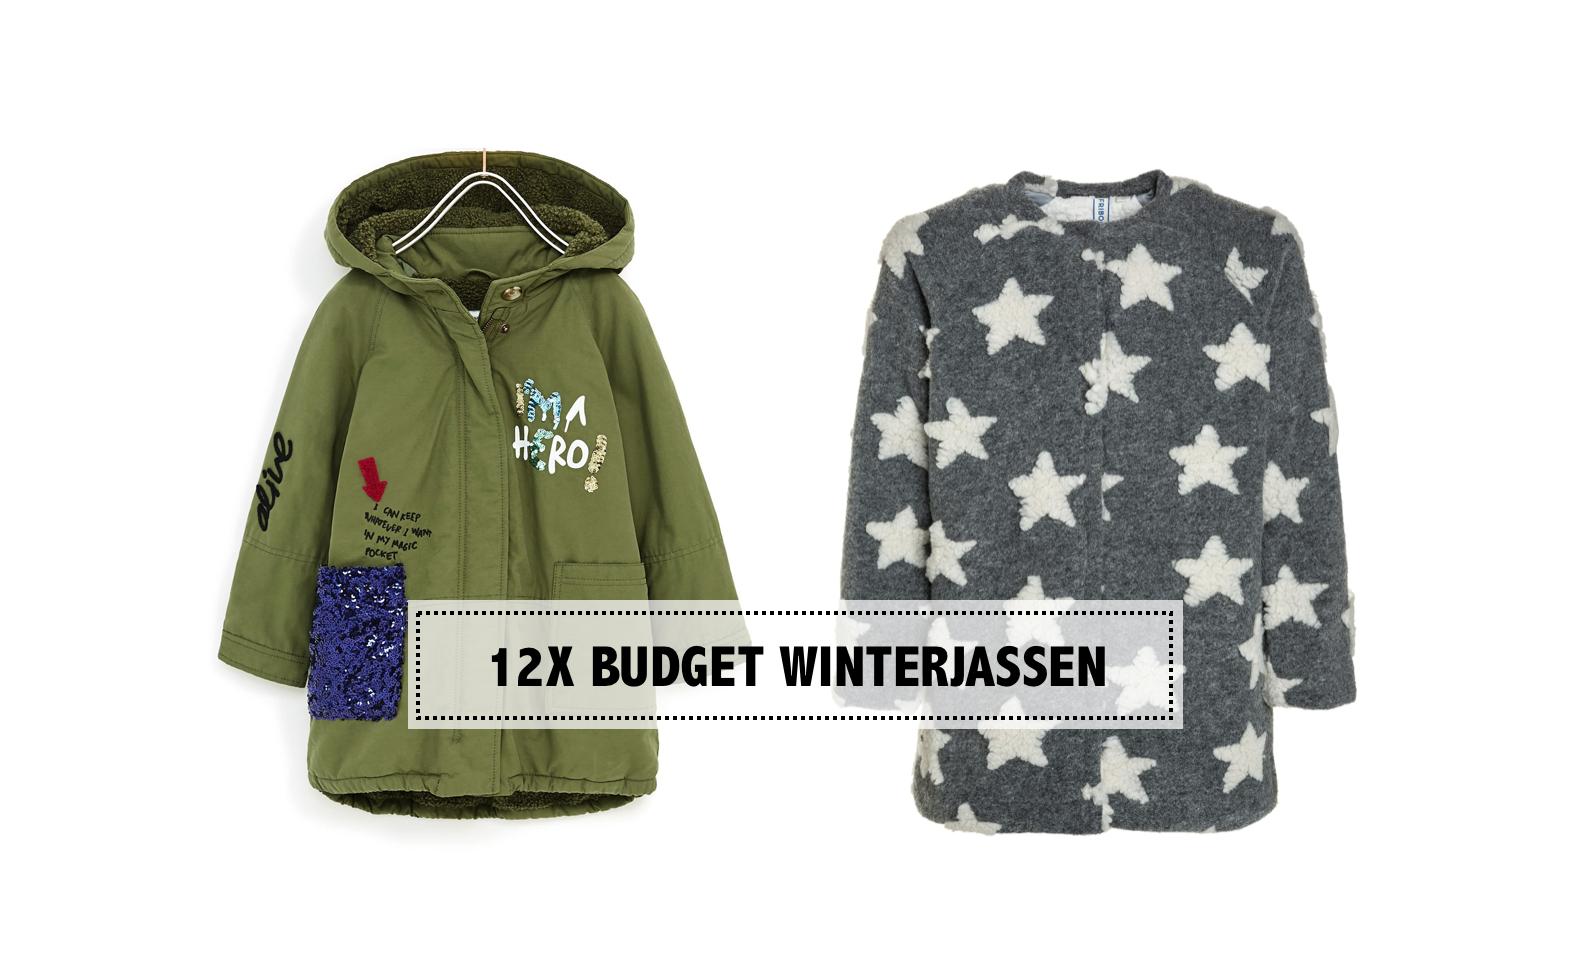 12X BUDGET WINTERJASSEN ONDER €50,-